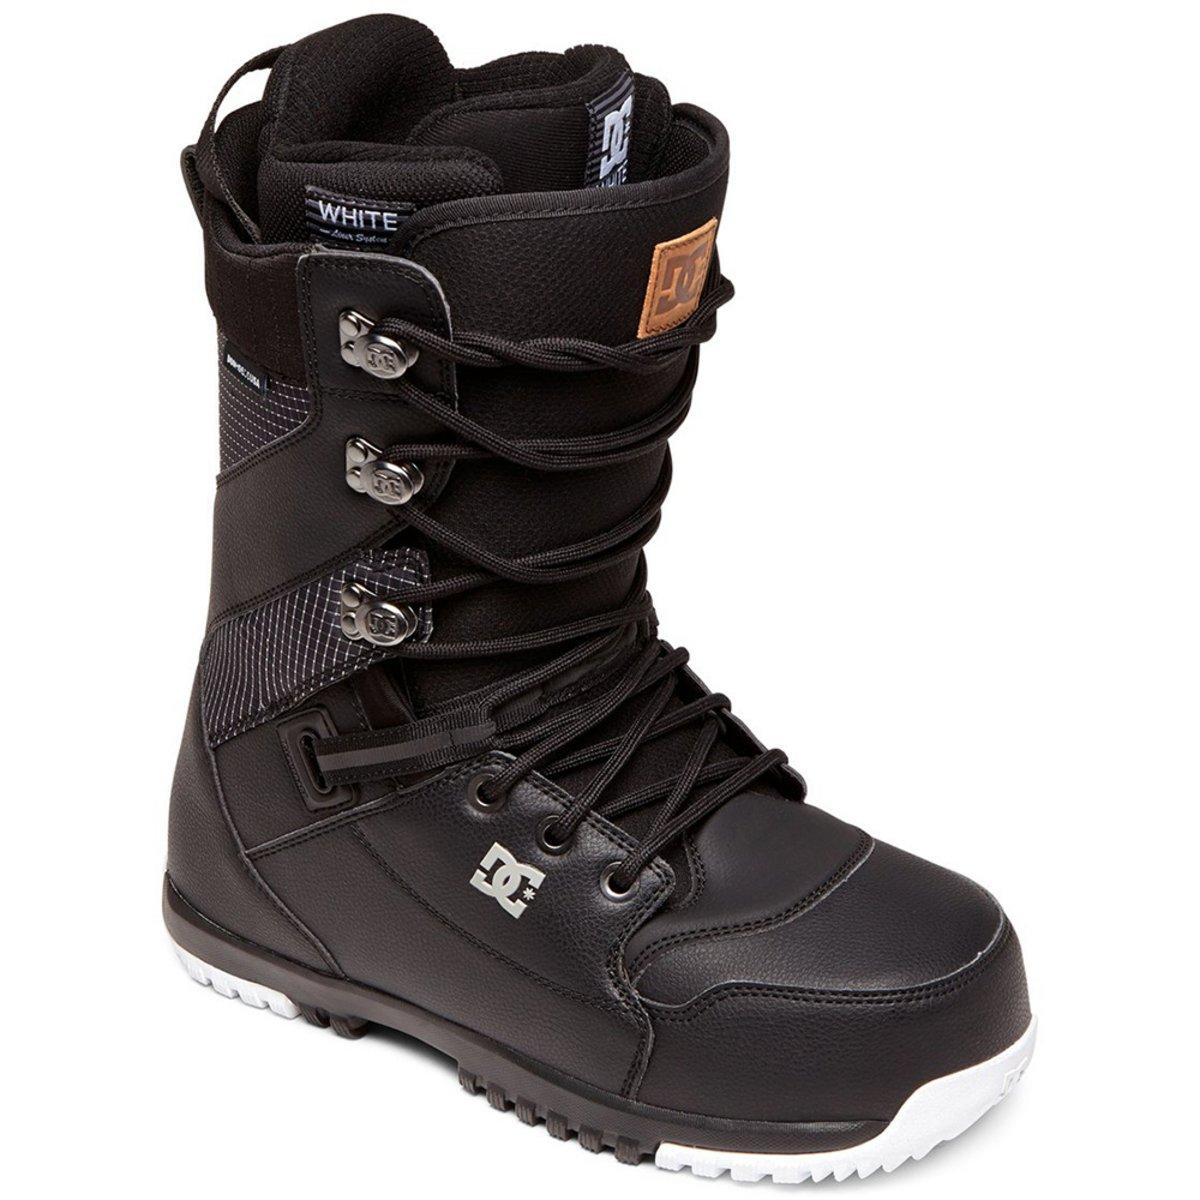 DC Men's Mutiny Snowboard Boots 2019 / 2020 0